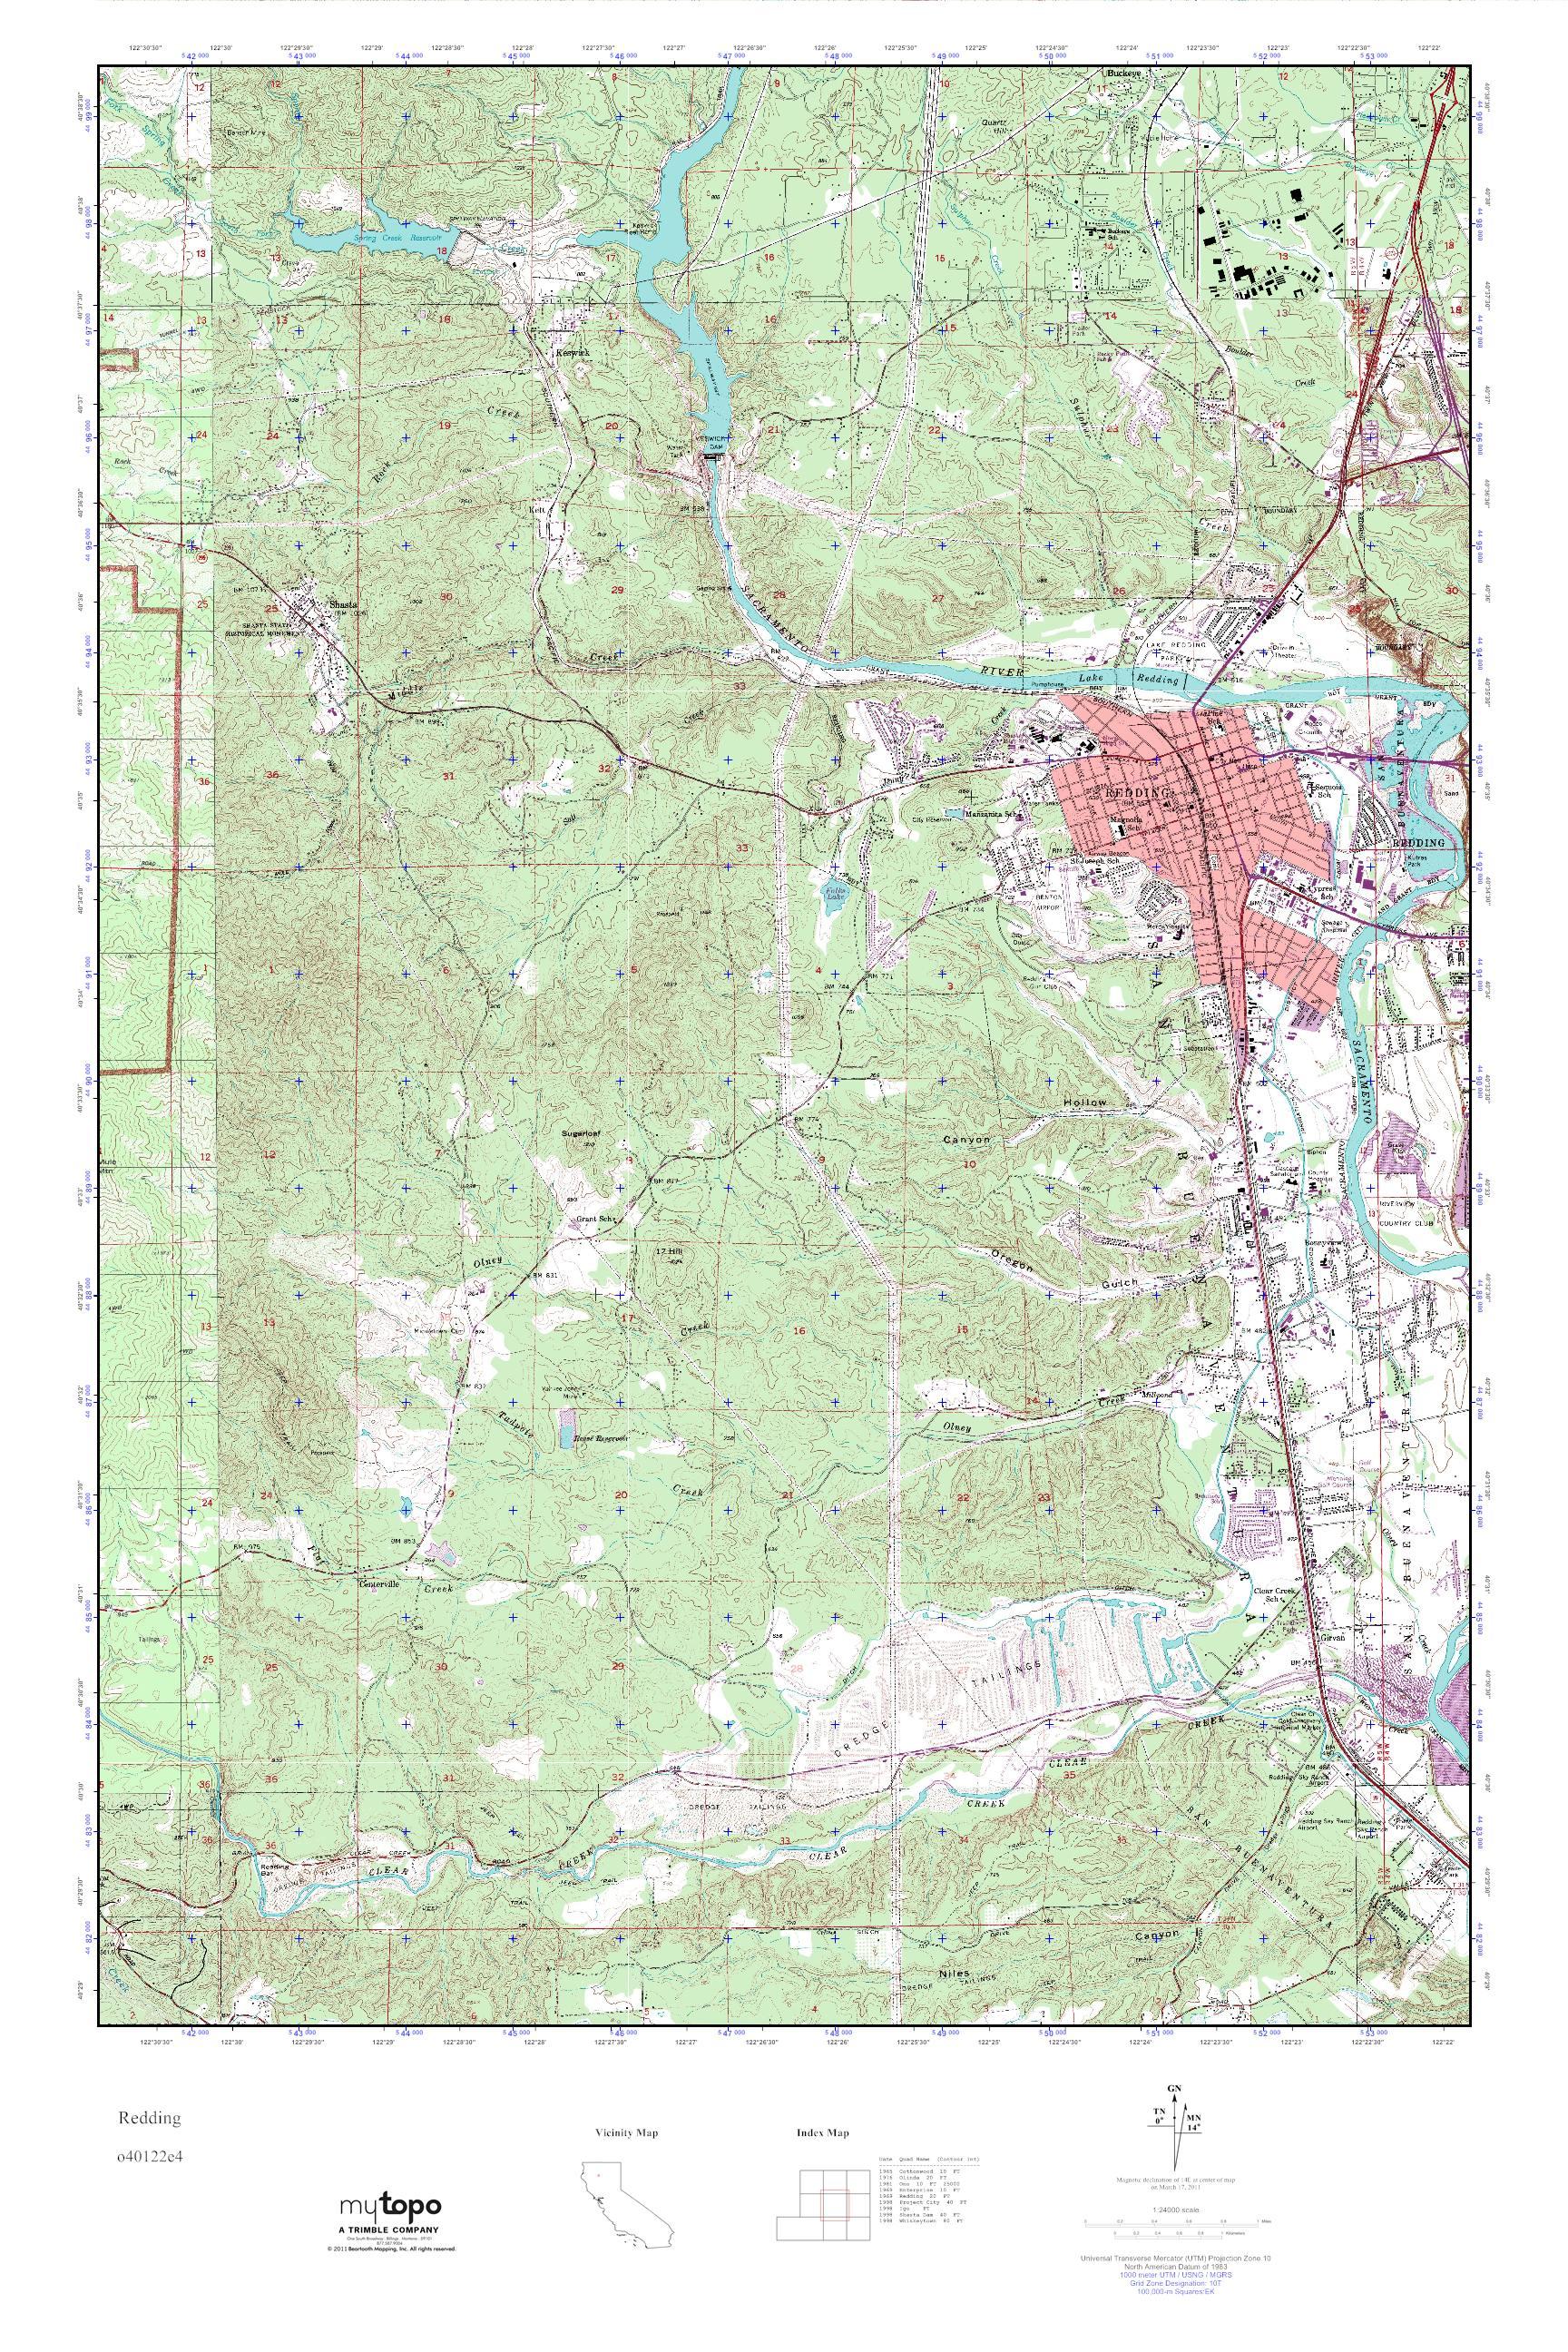 MyTopo Redding California USGS Quad Topo Map